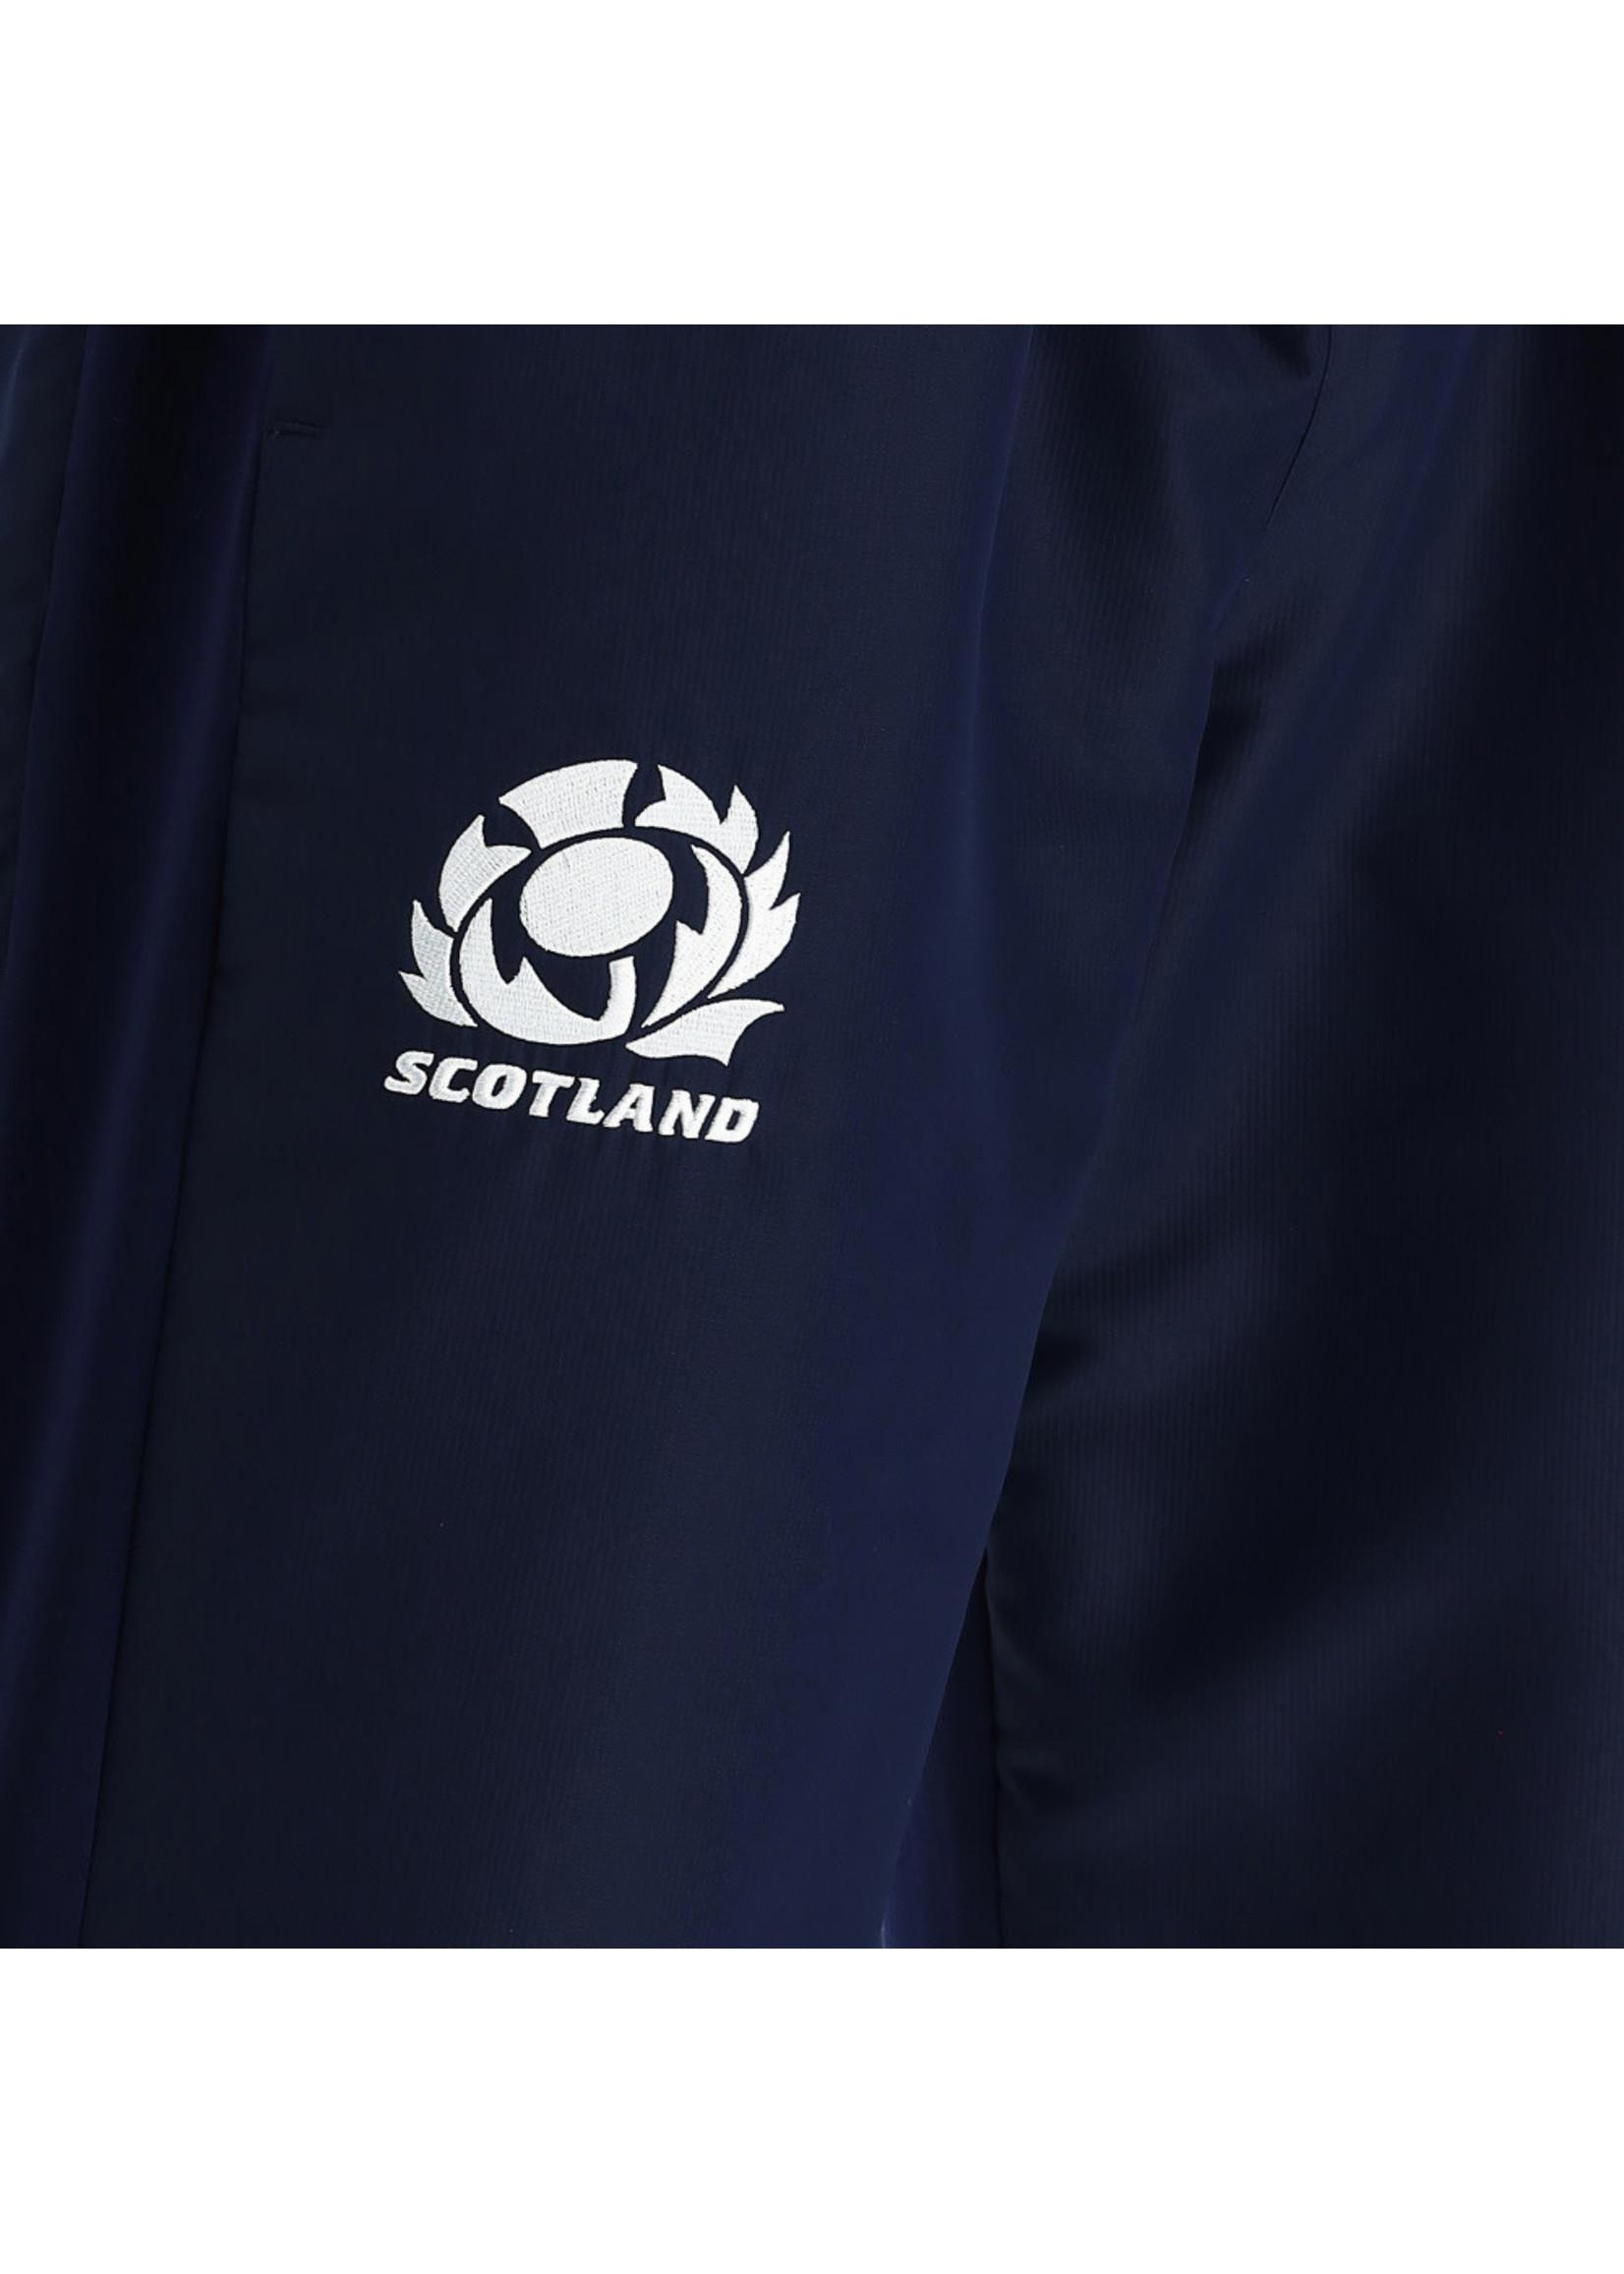 Macron Macron Scotland Rugby - Junior Travel Track Pant (2021/22)